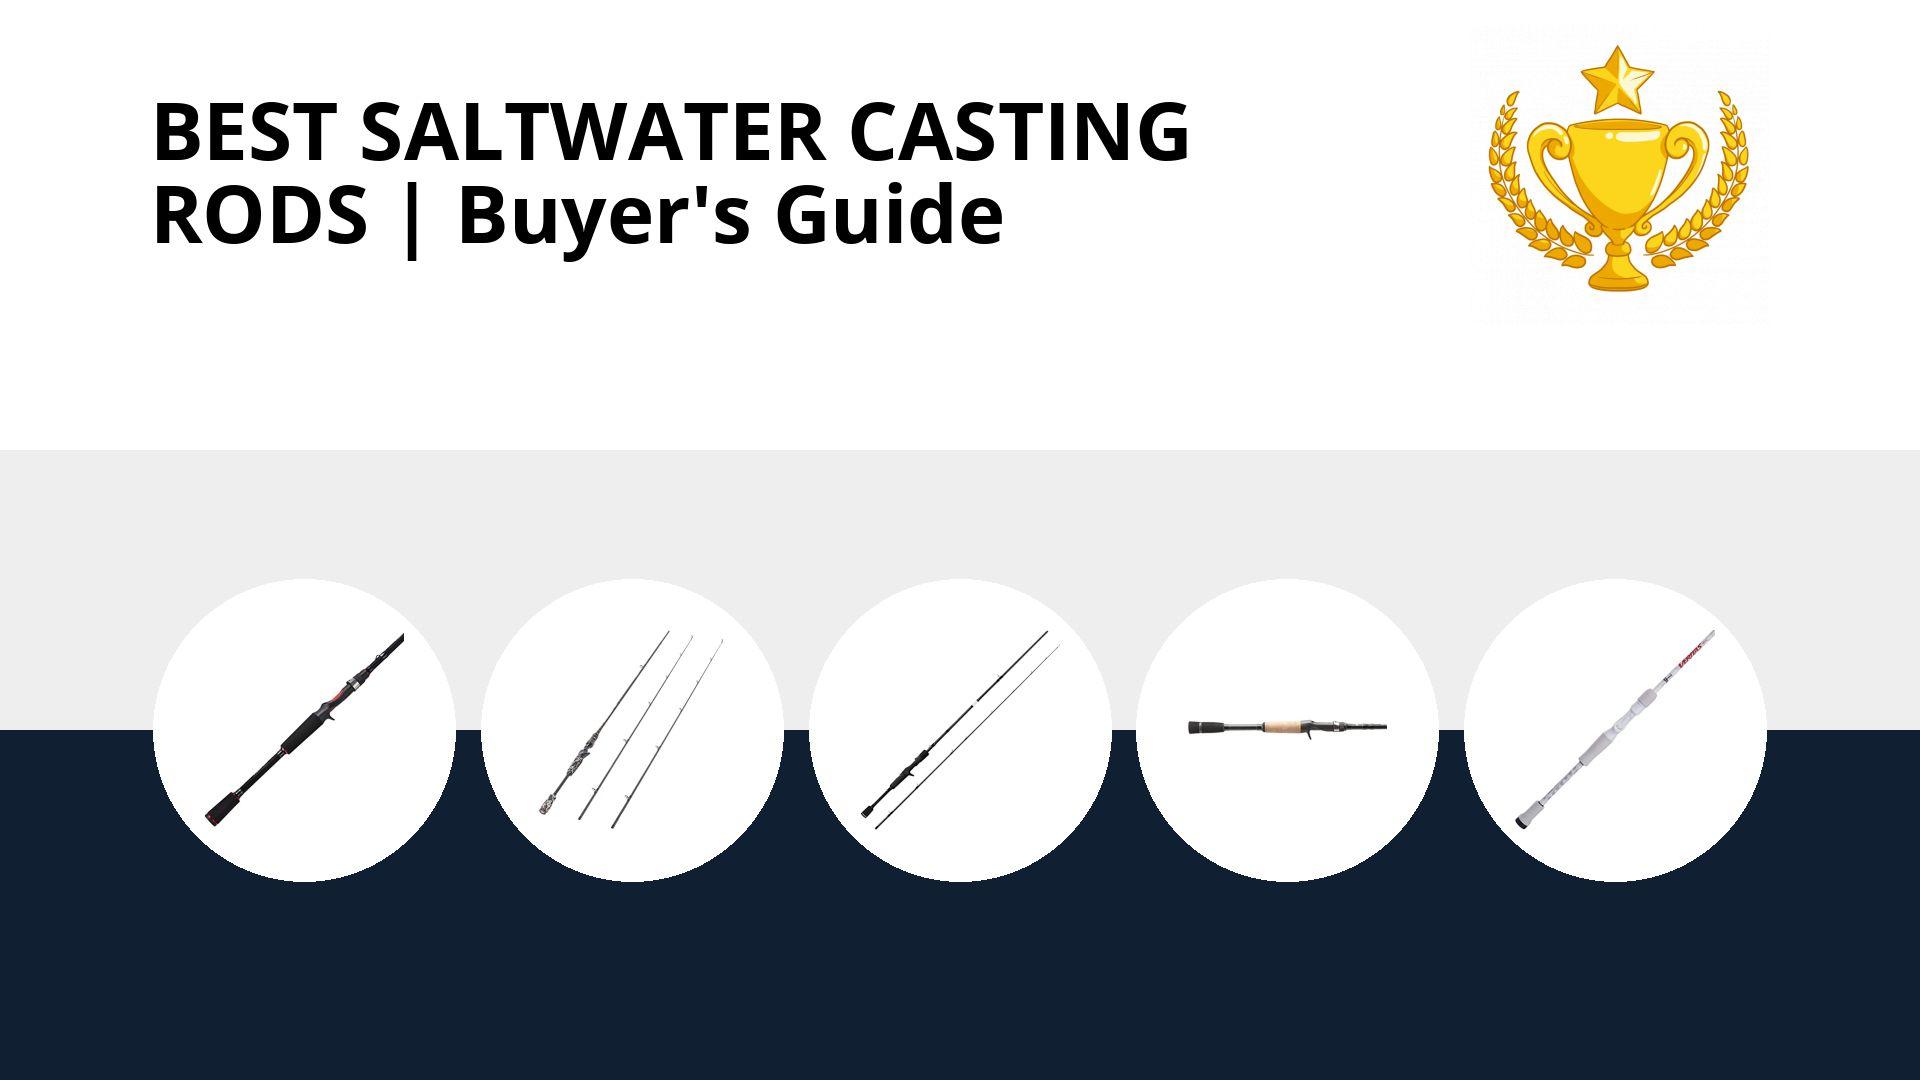 Best Saltwater Casting Rods: image